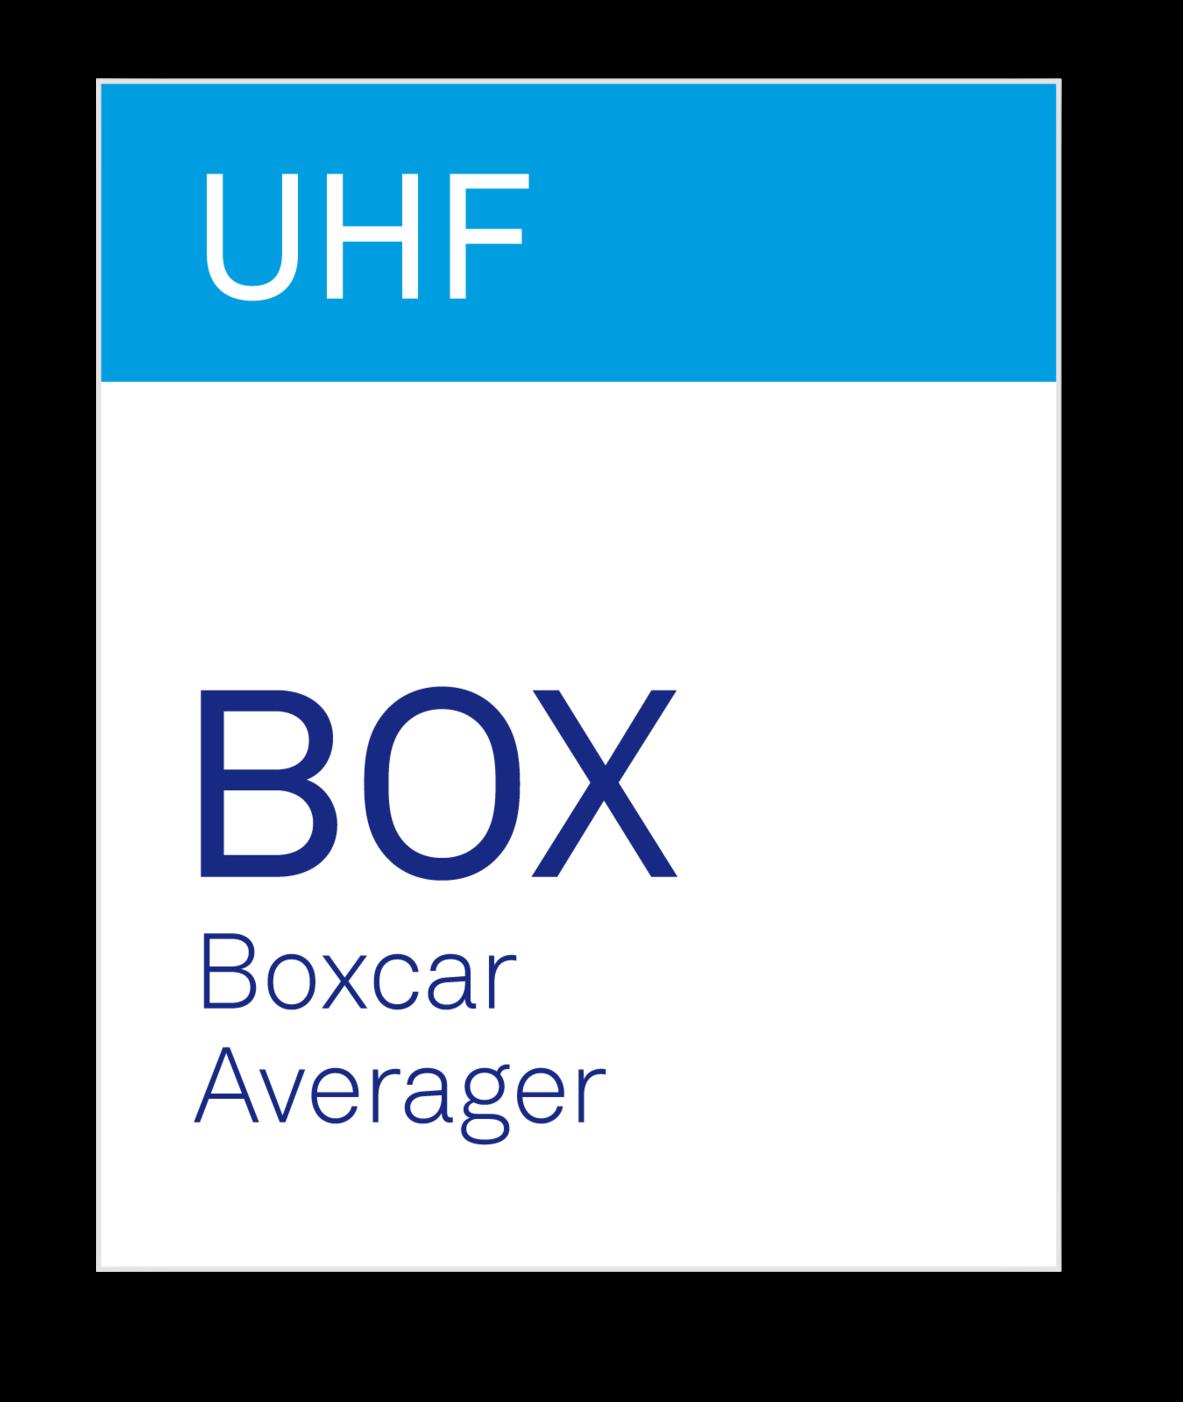 Zurich Instruments UHF-BOX Boxcar Averager